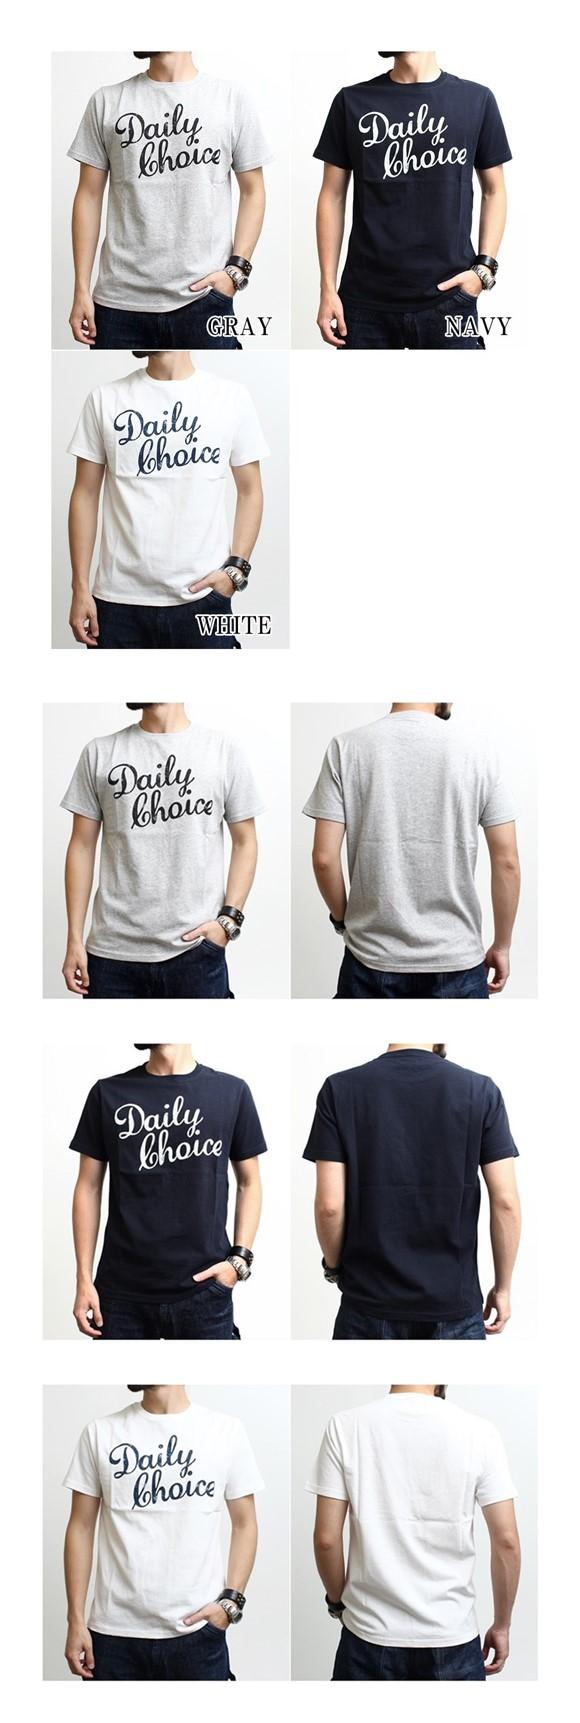 2016-08-25 USAコットンプリントTシャツ Daily Choice レヴォ Revo 7-vert